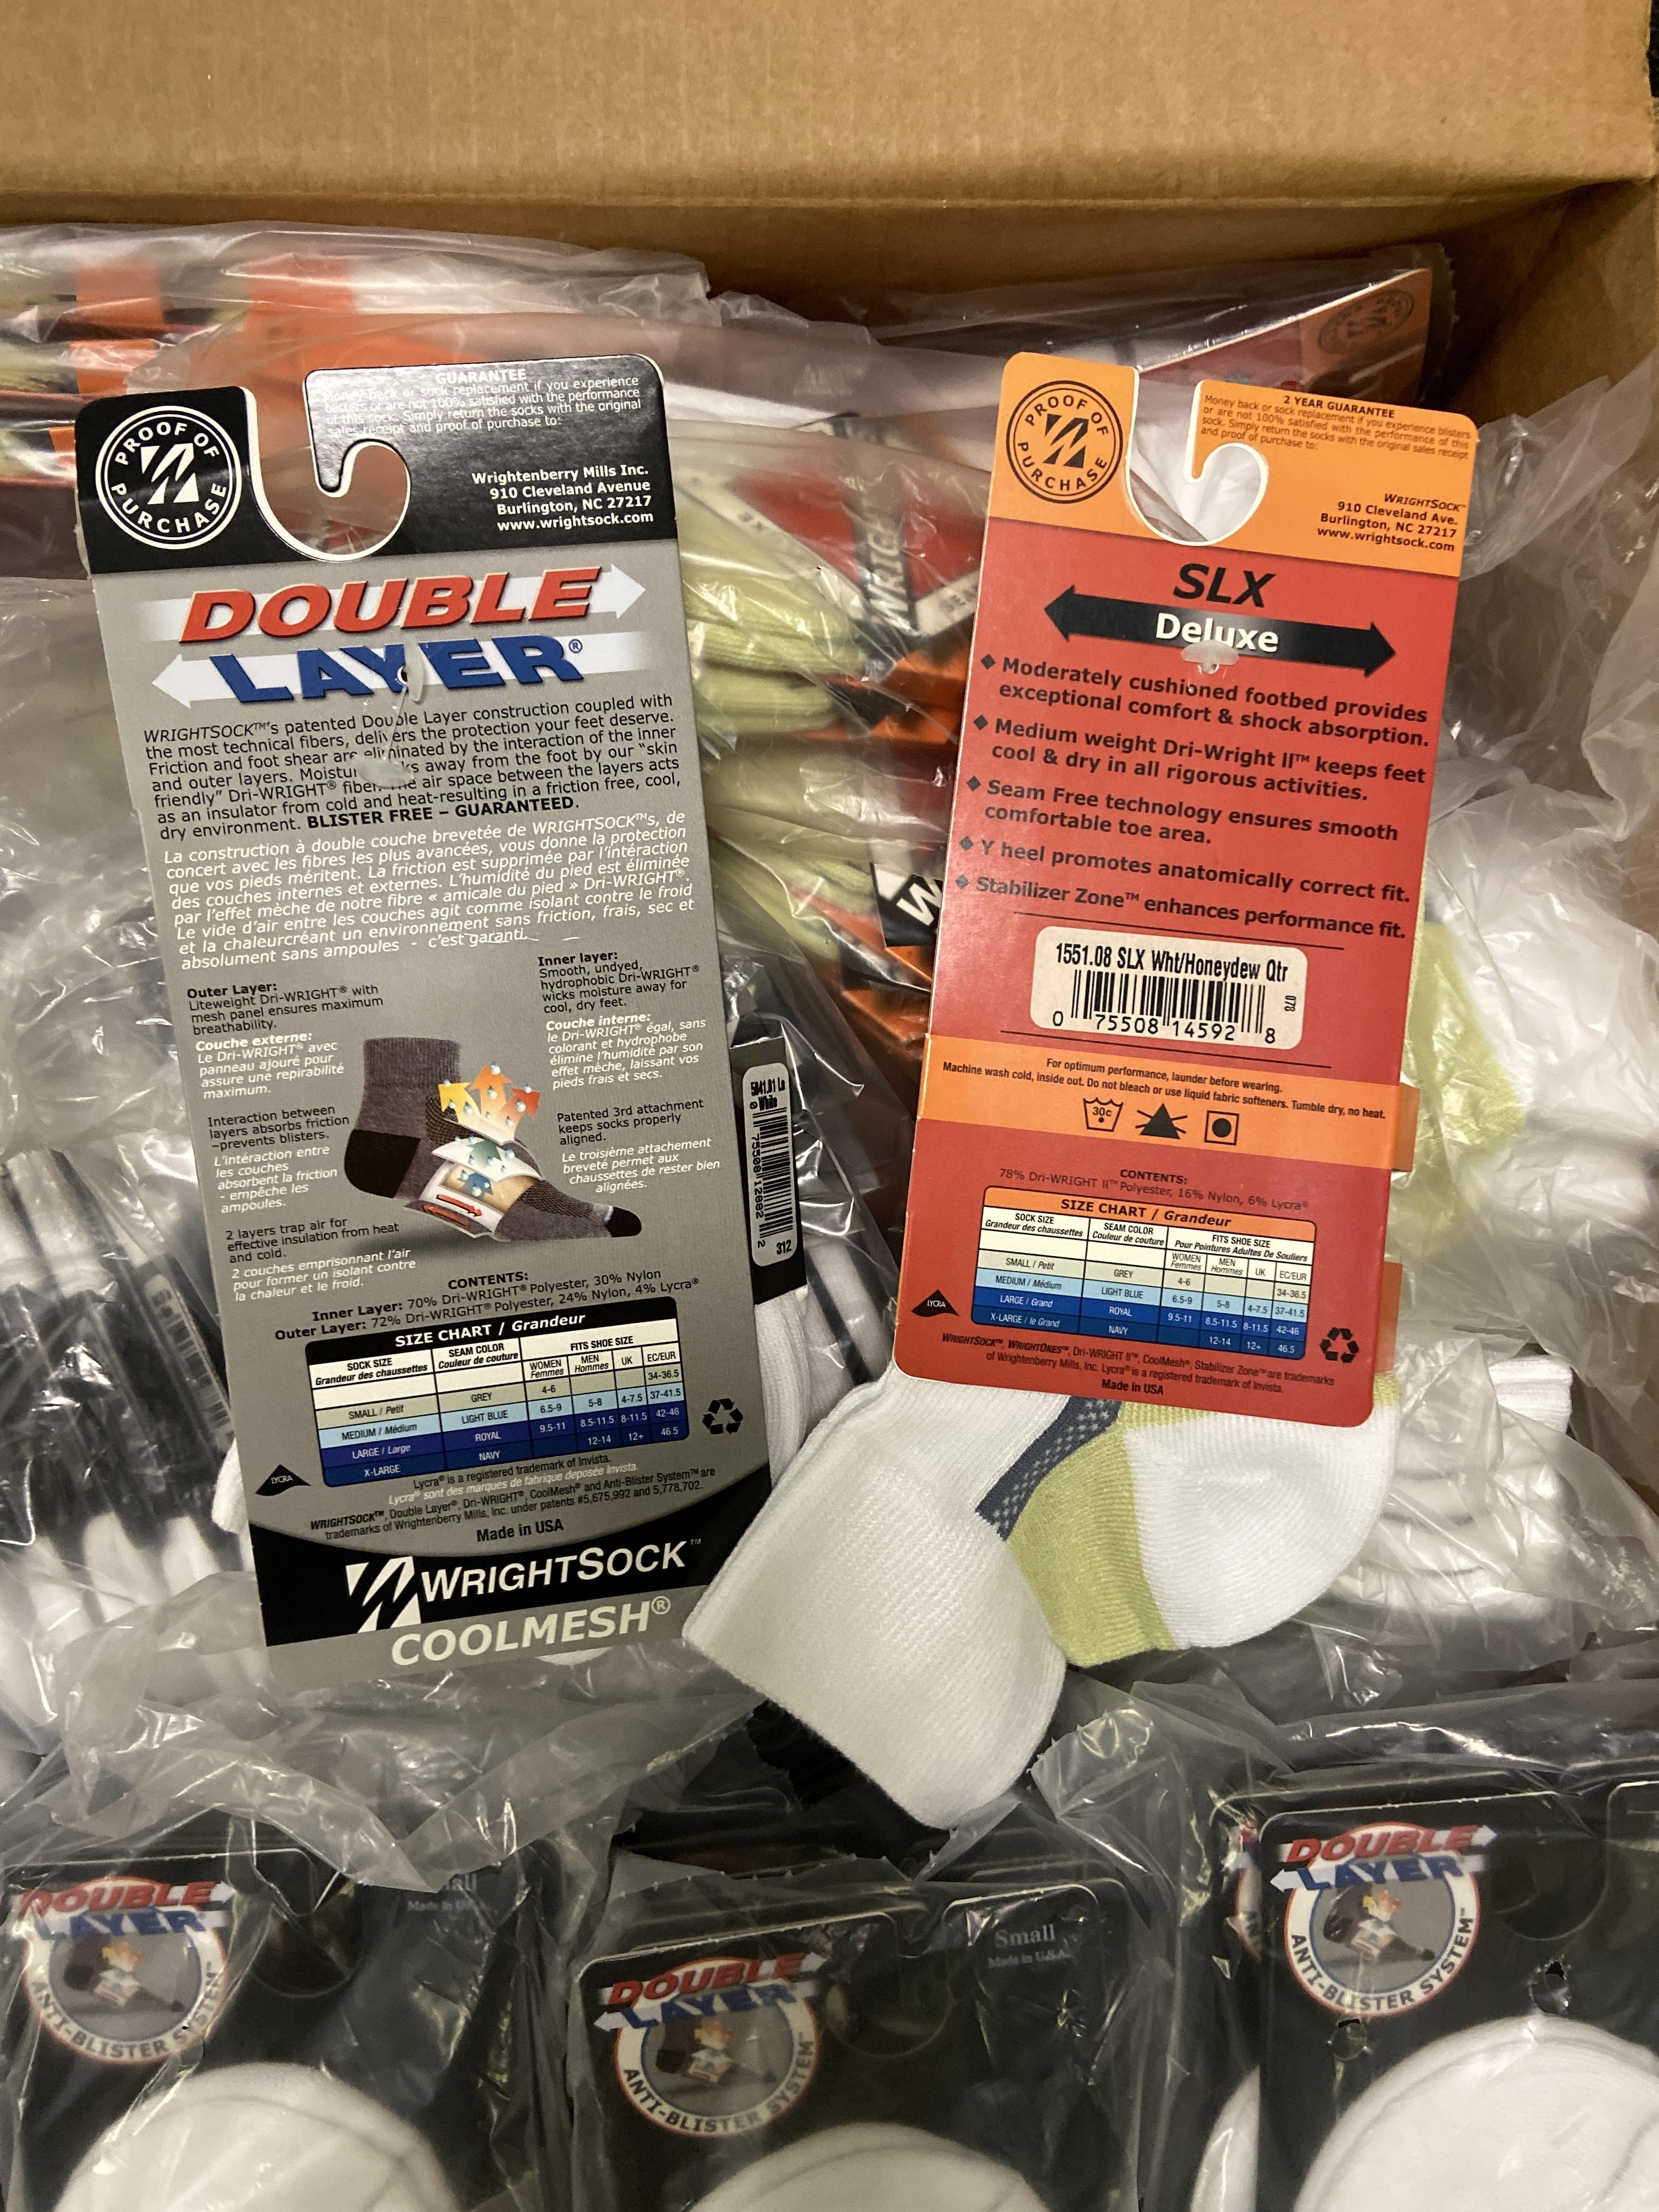 Lot 27 - 500+ packs of New Socks, Wrightsocks Coolmesh and WrightOnes SLX, Various White Styles Lot